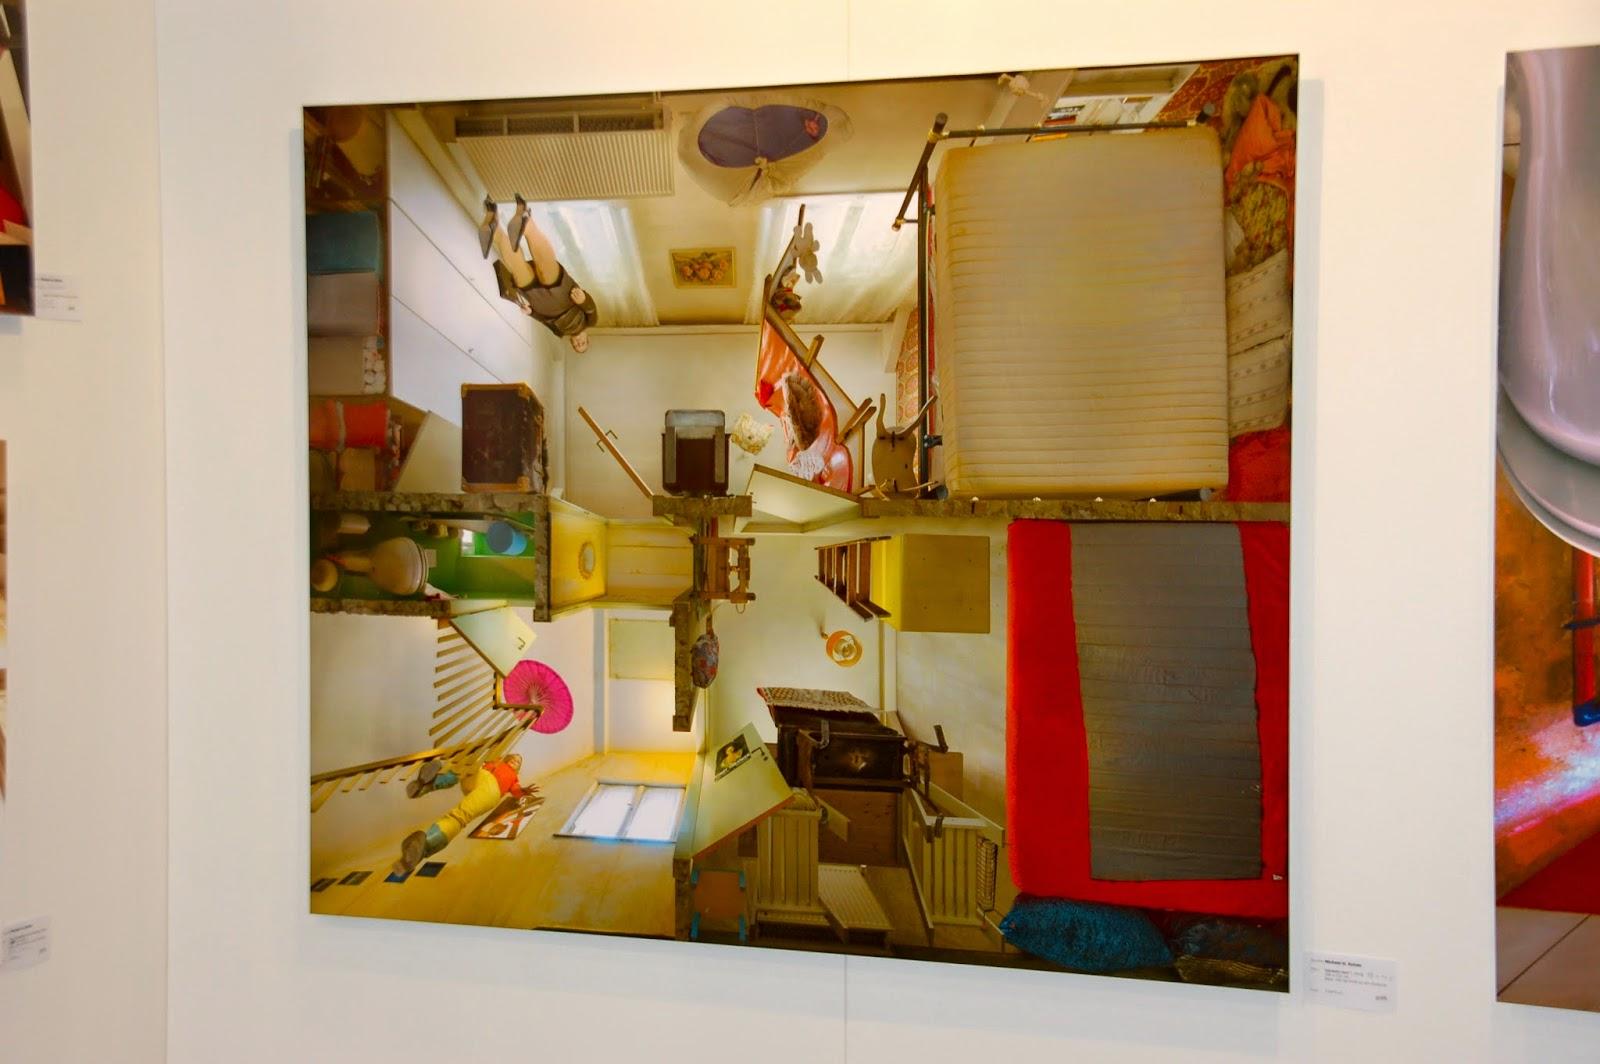 margarita k malerei grafik design besuch der kunstausstellung affordable art fair hamburg 2014. Black Bedroom Furniture Sets. Home Design Ideas